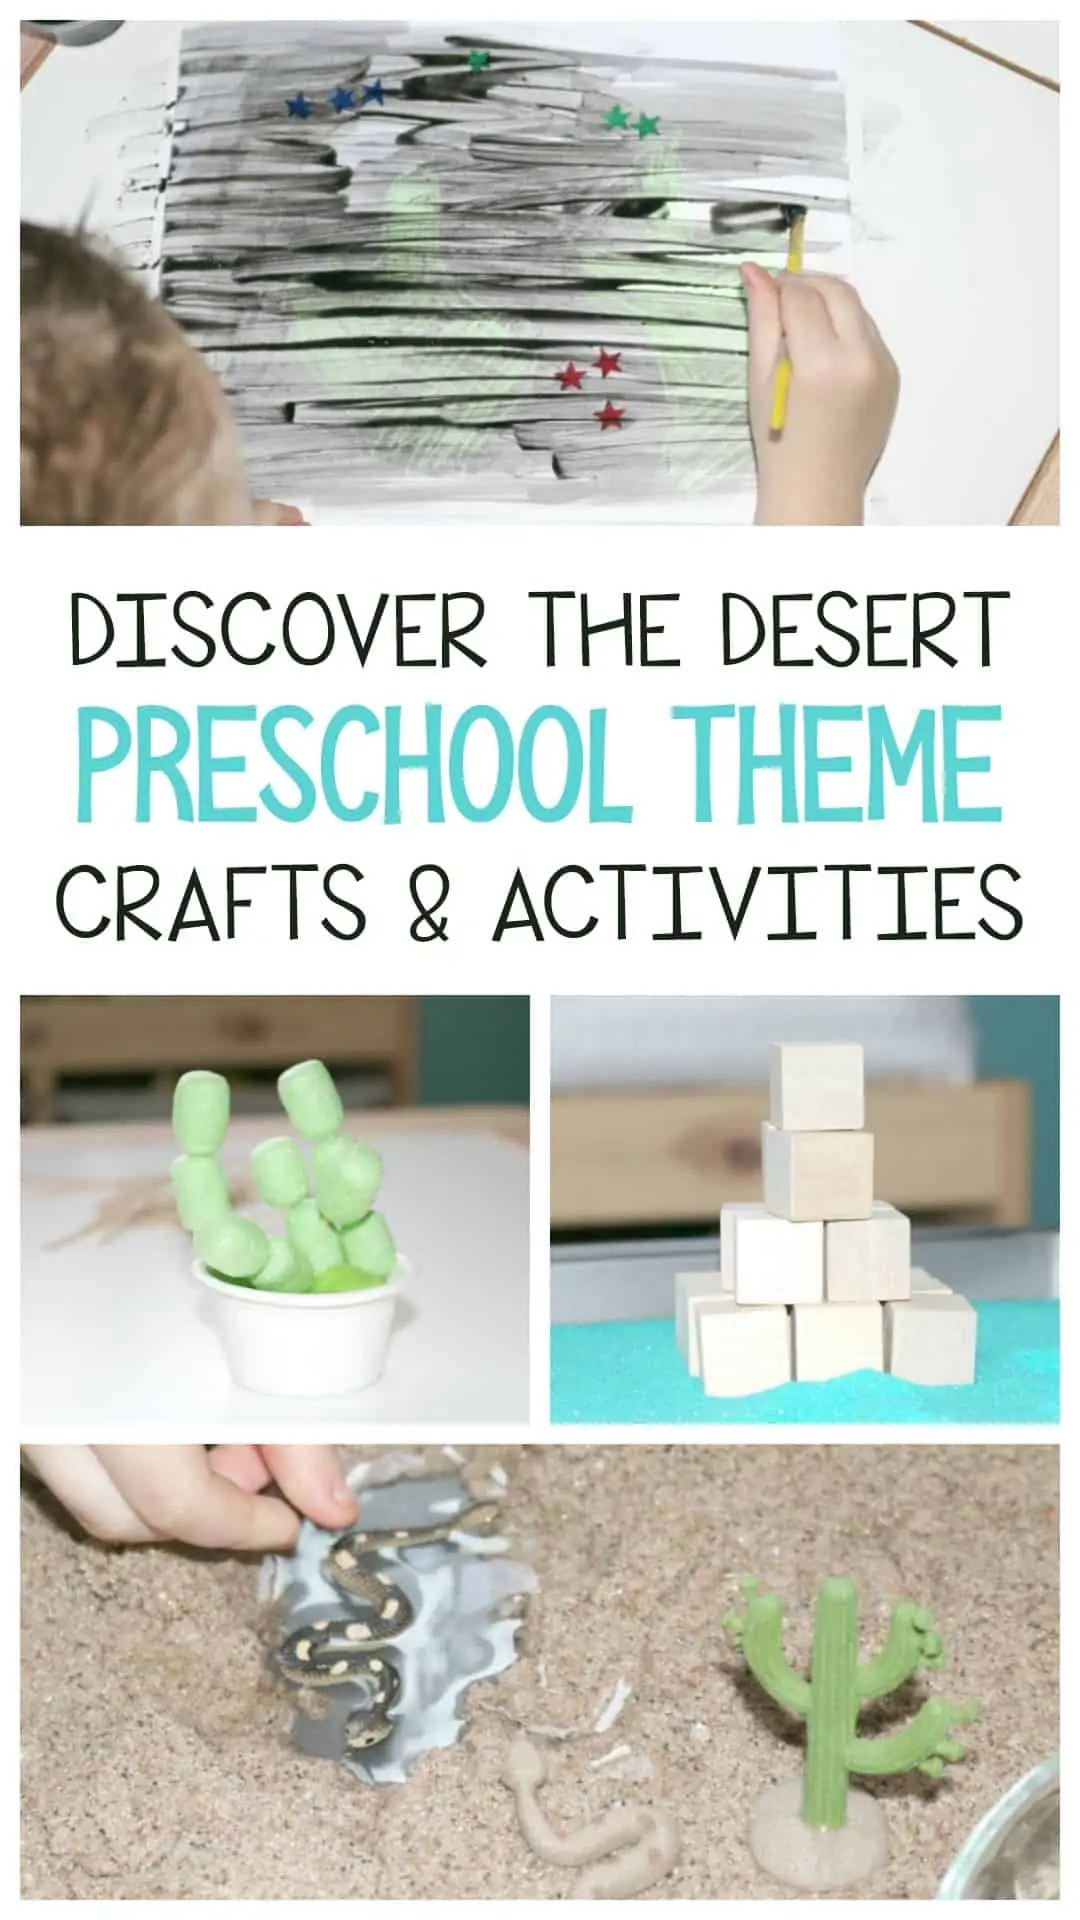 Discover The Desert Preschool Theme Crafts Amp Activities